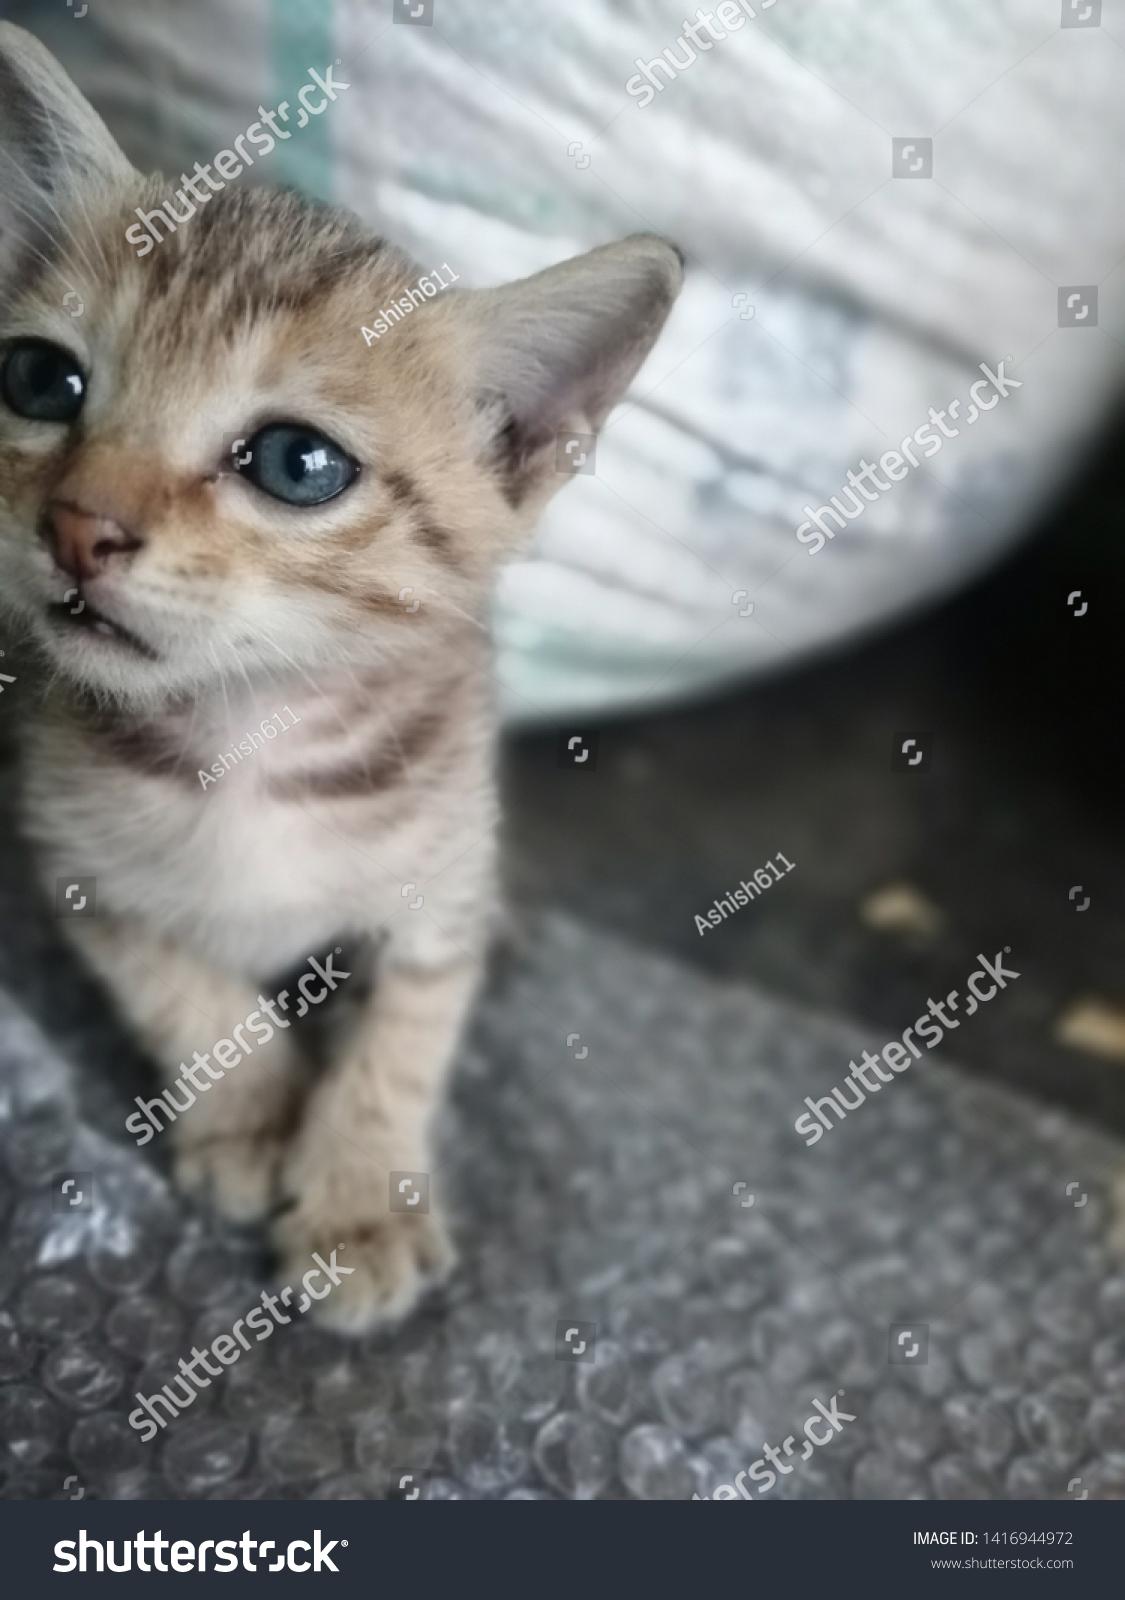 Sweet Cute Tabby Cat Baby Kitten Animals Wildlife Stock Image 1416944972